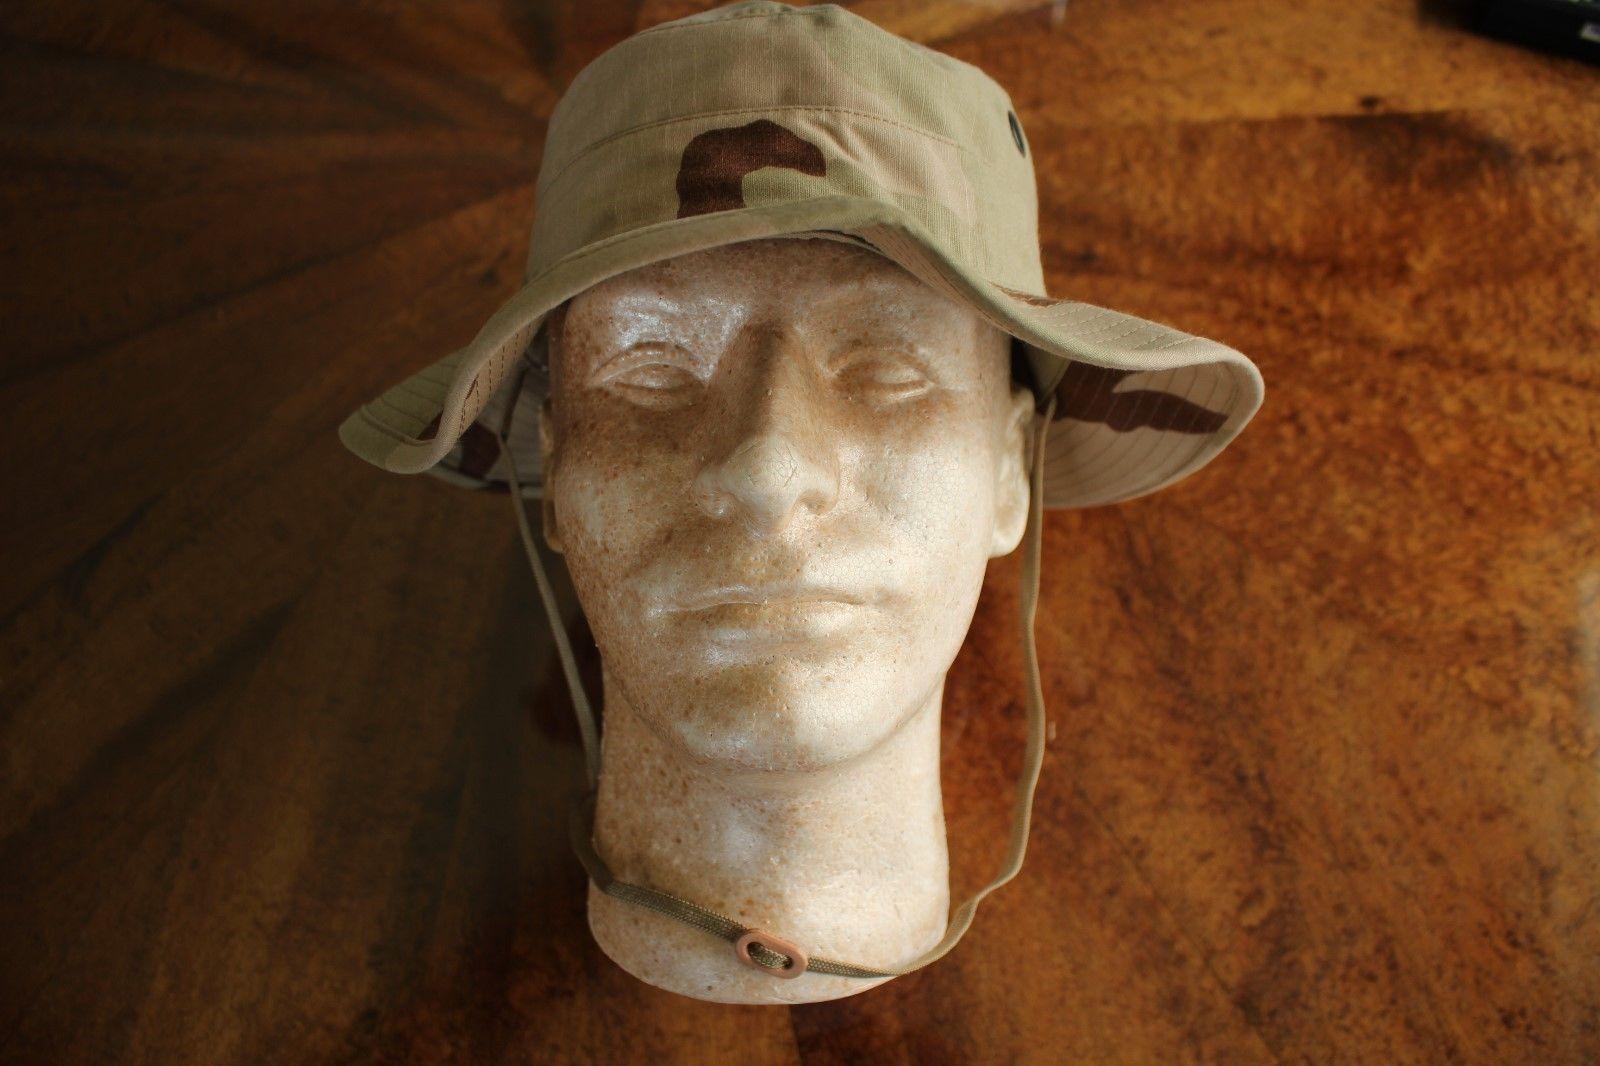 b2278dca1bc Usmc Marine Corps Desert Bdu Ripstop Camo and 50 similar items